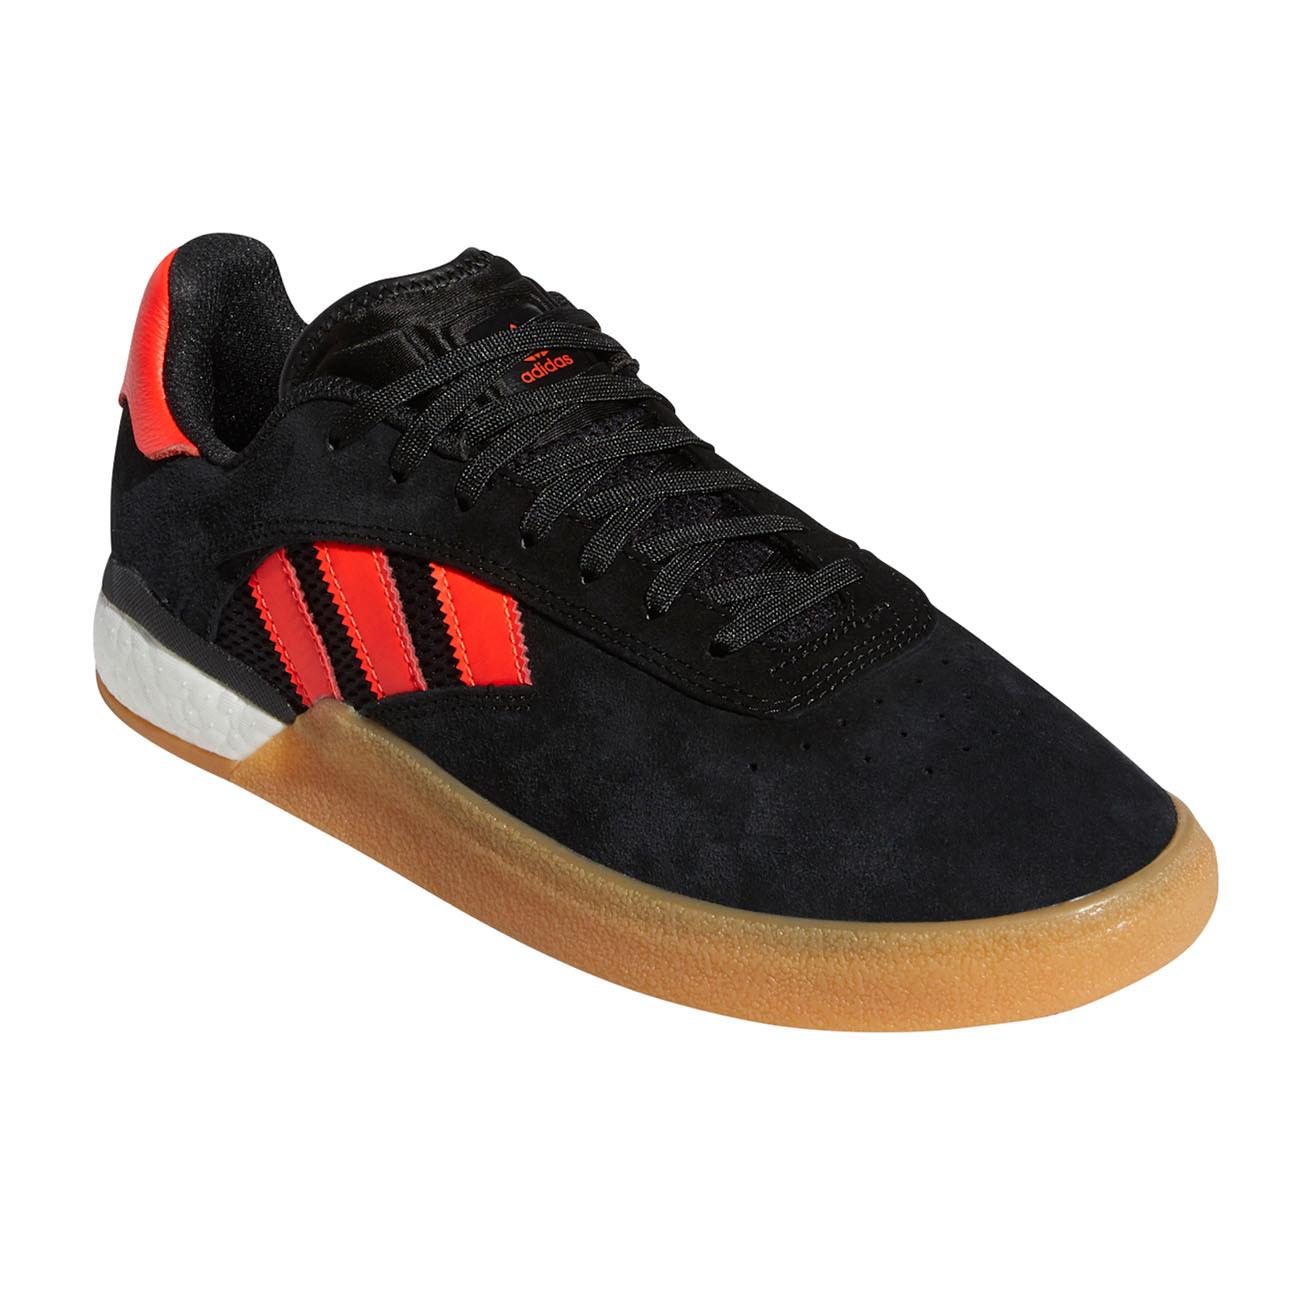 Baño solidaridad alarma  Skate shoes Adidas 3St.004 core black/solar red/ftwr white   Snowboard  Zezula